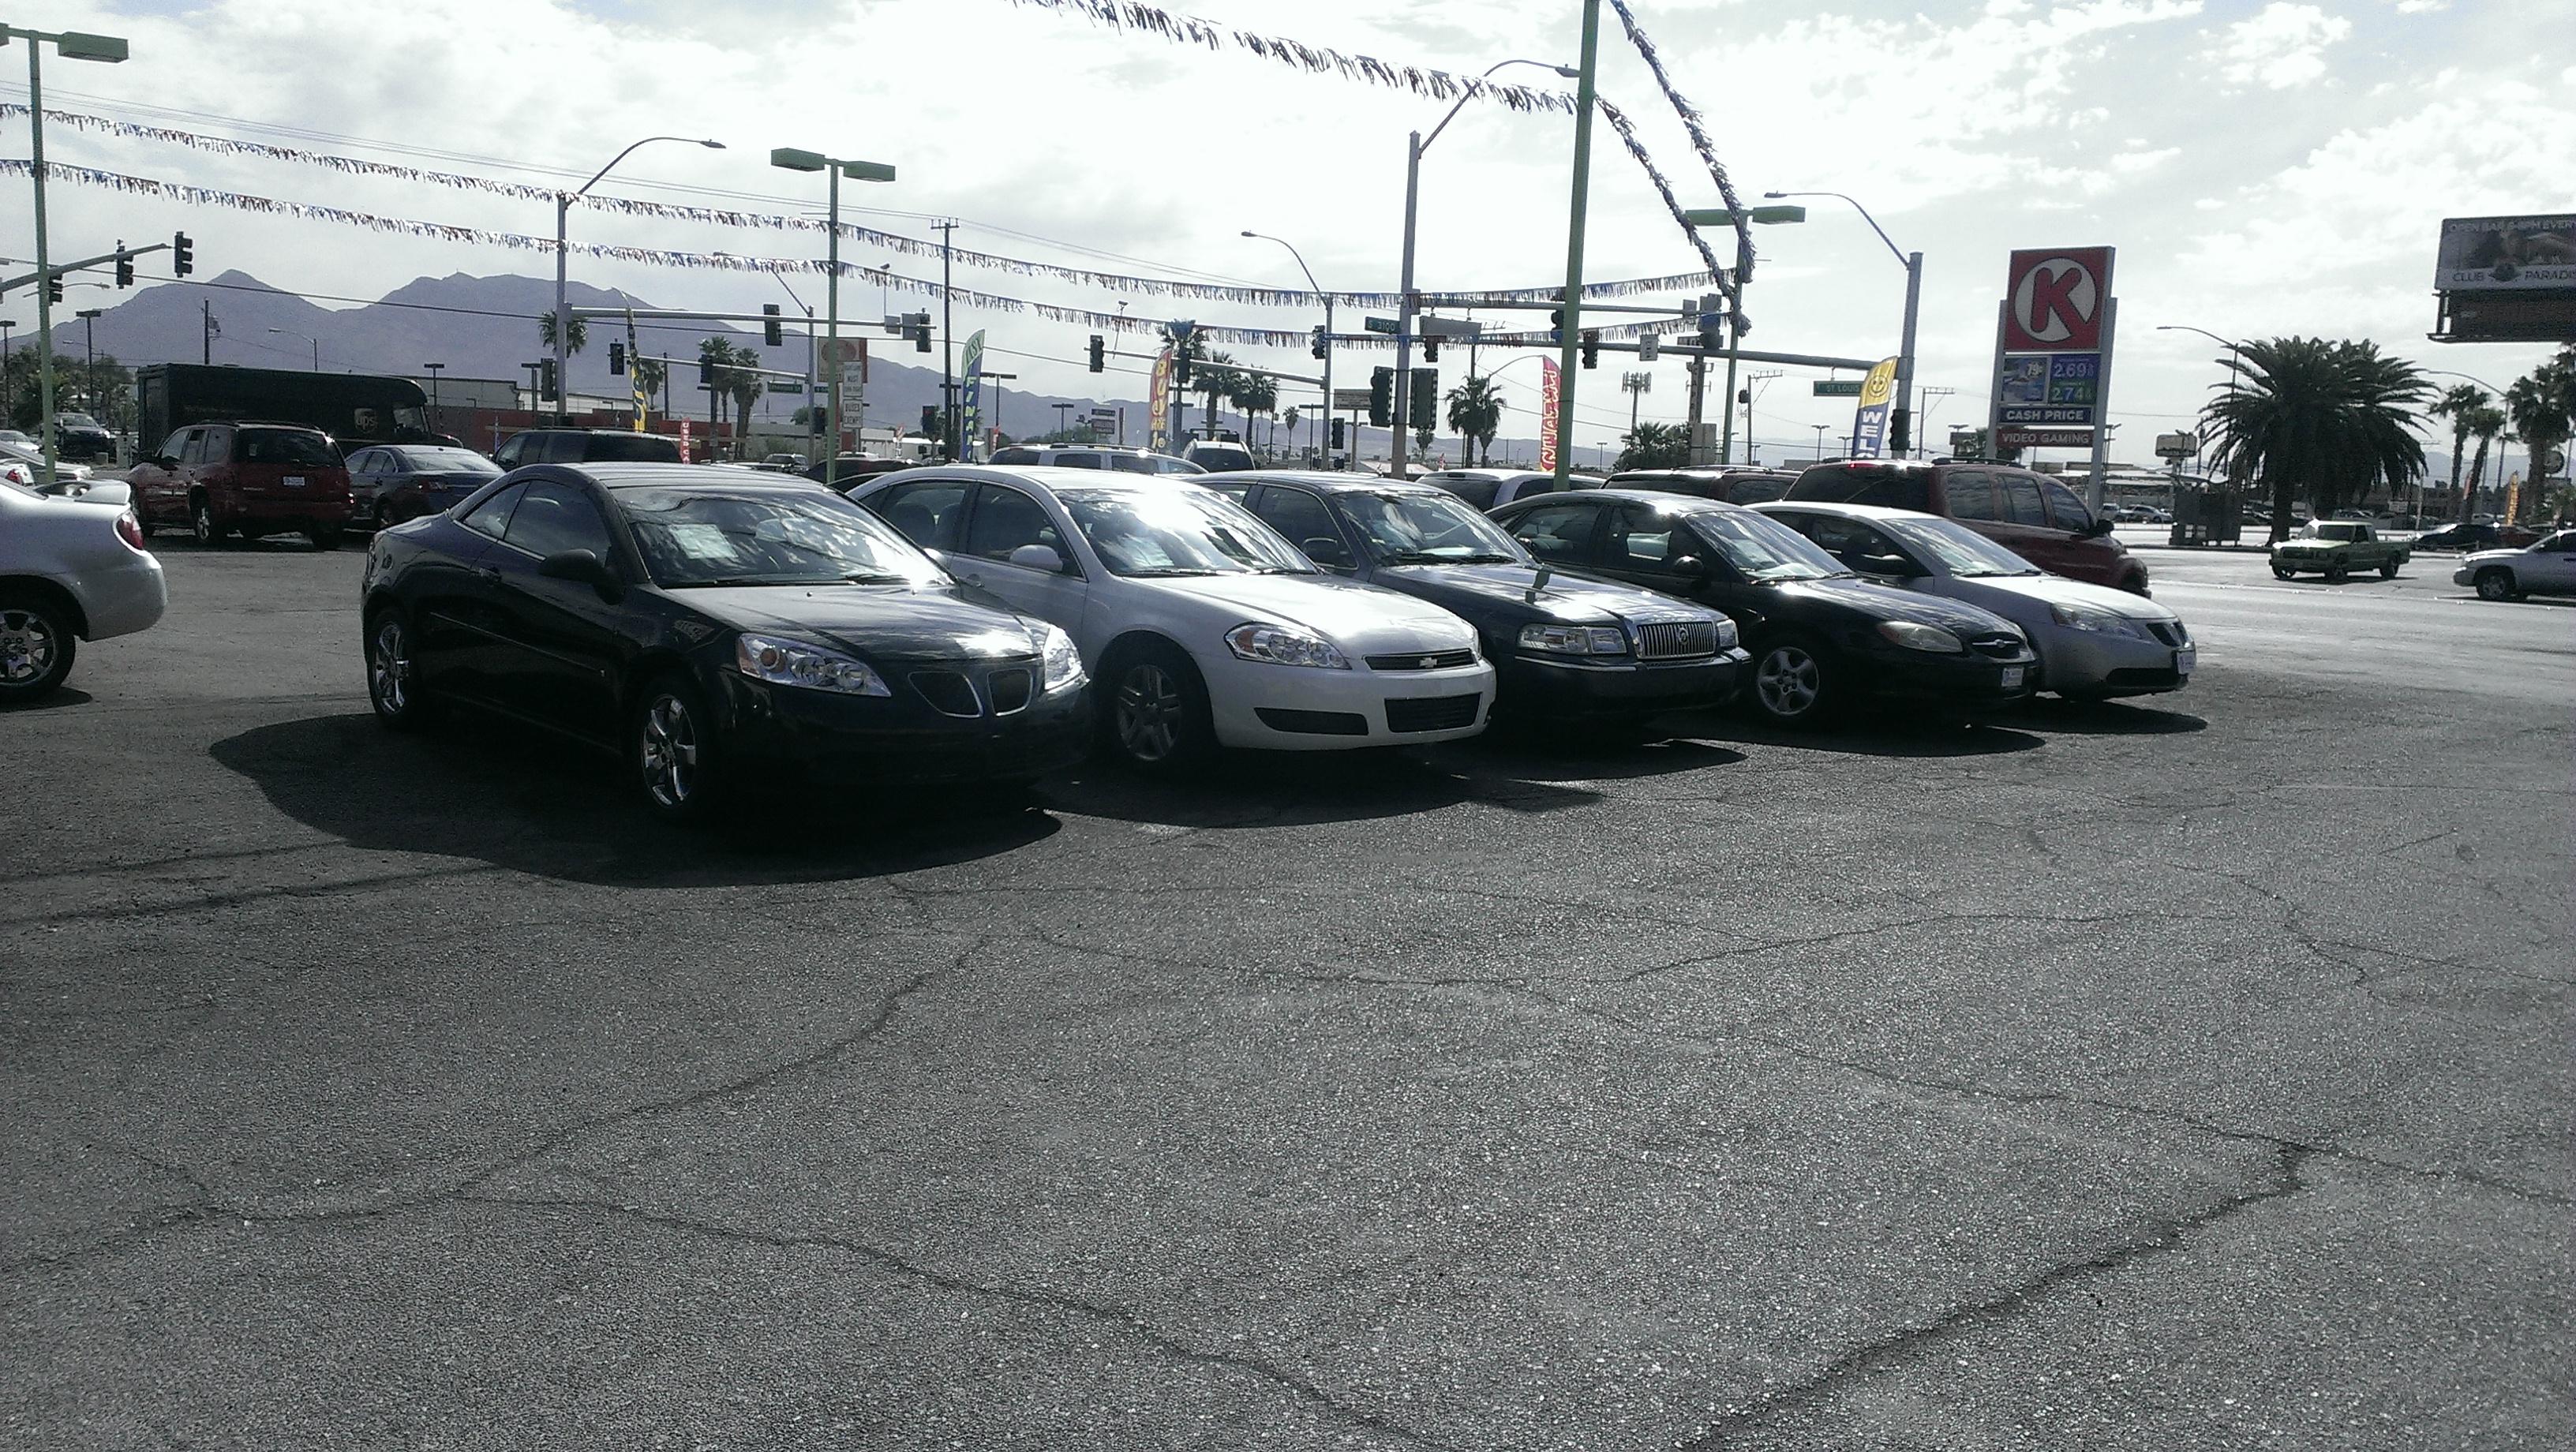 auto world sales leasing at 3190 fremont street las vegas nv on fave. Black Bedroom Furniture Sets. Home Design Ideas